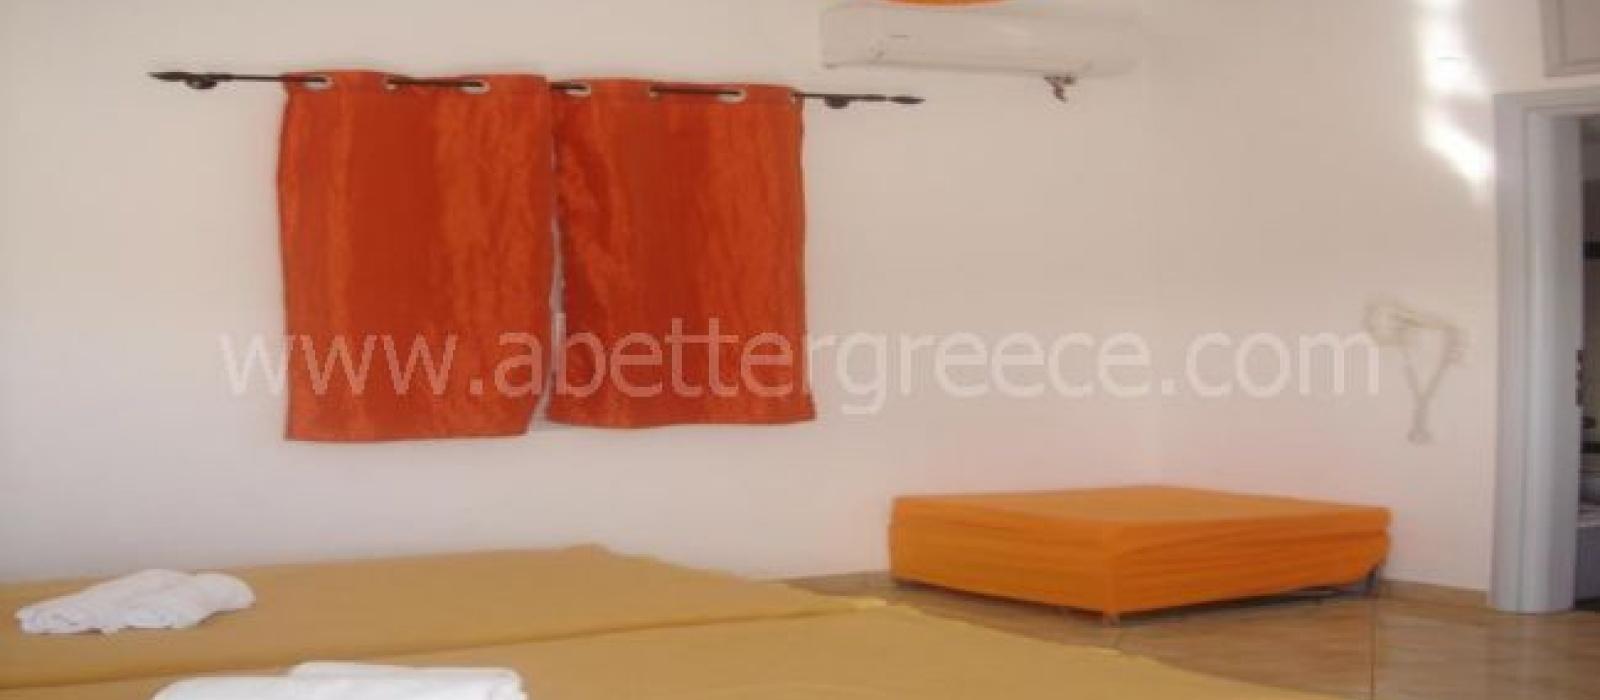 1 Bedrooms, Apartment, Vacation Rental, 1 Bathrooms, Listing ID 1165, Iraklia, Greece,